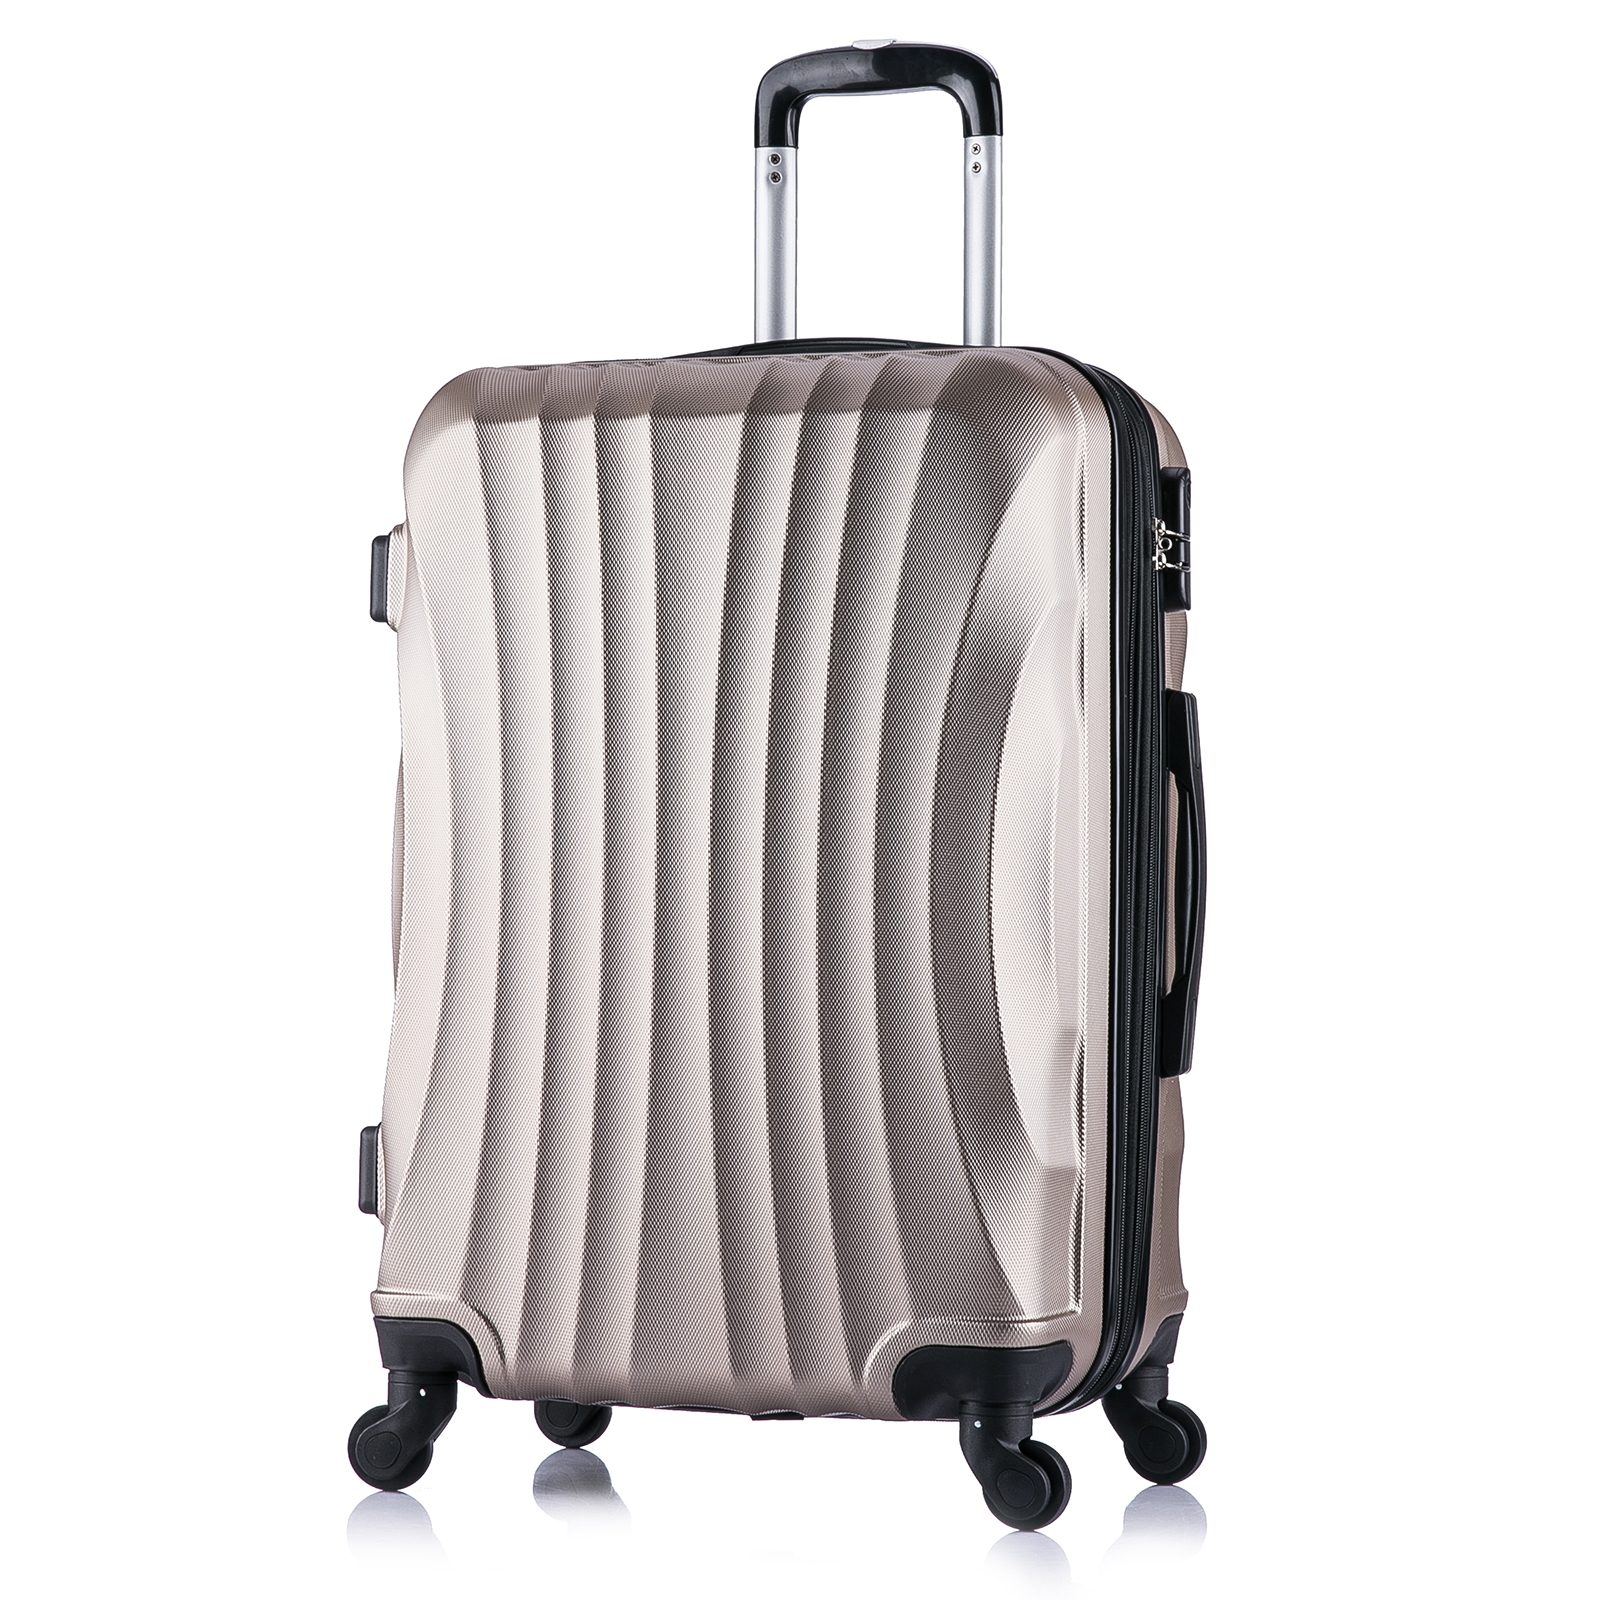 koffer trolley reisekoffer hartschalenkoffer handgep ck m. Black Bedroom Furniture Sets. Home Design Ideas